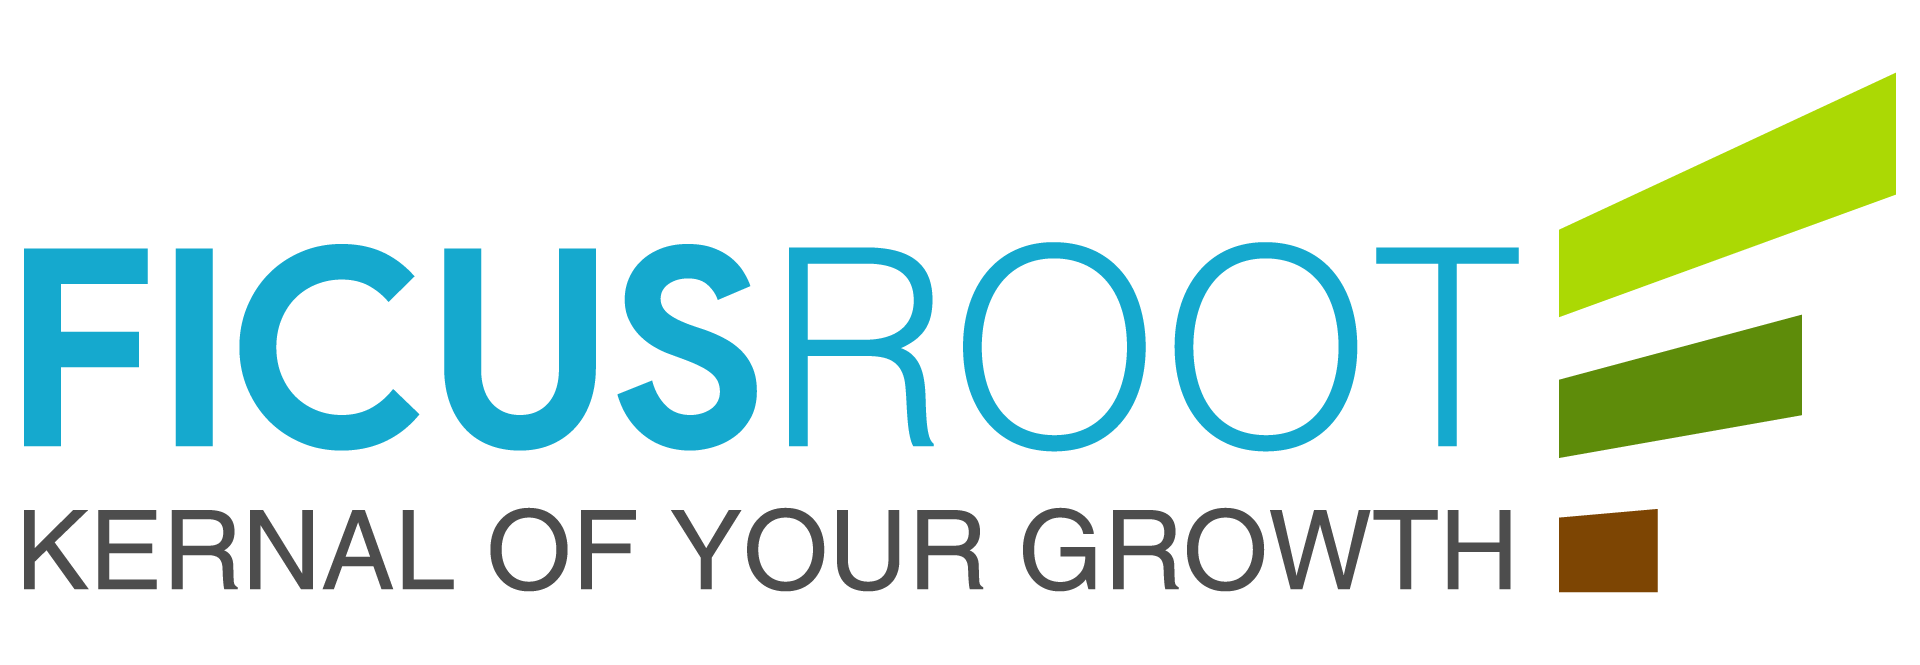 FicusRoot Logo